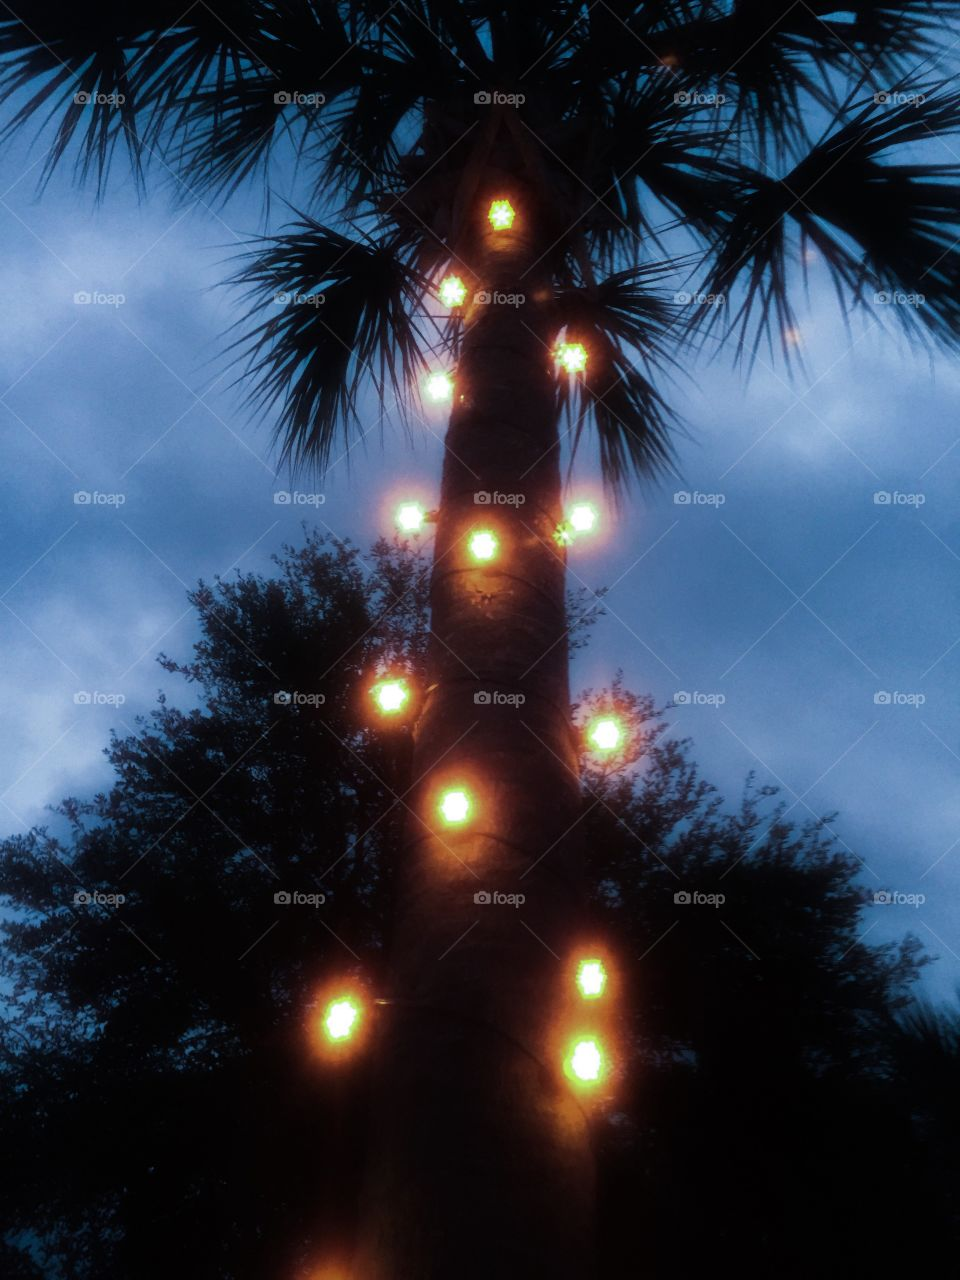 Tree illuminating with light